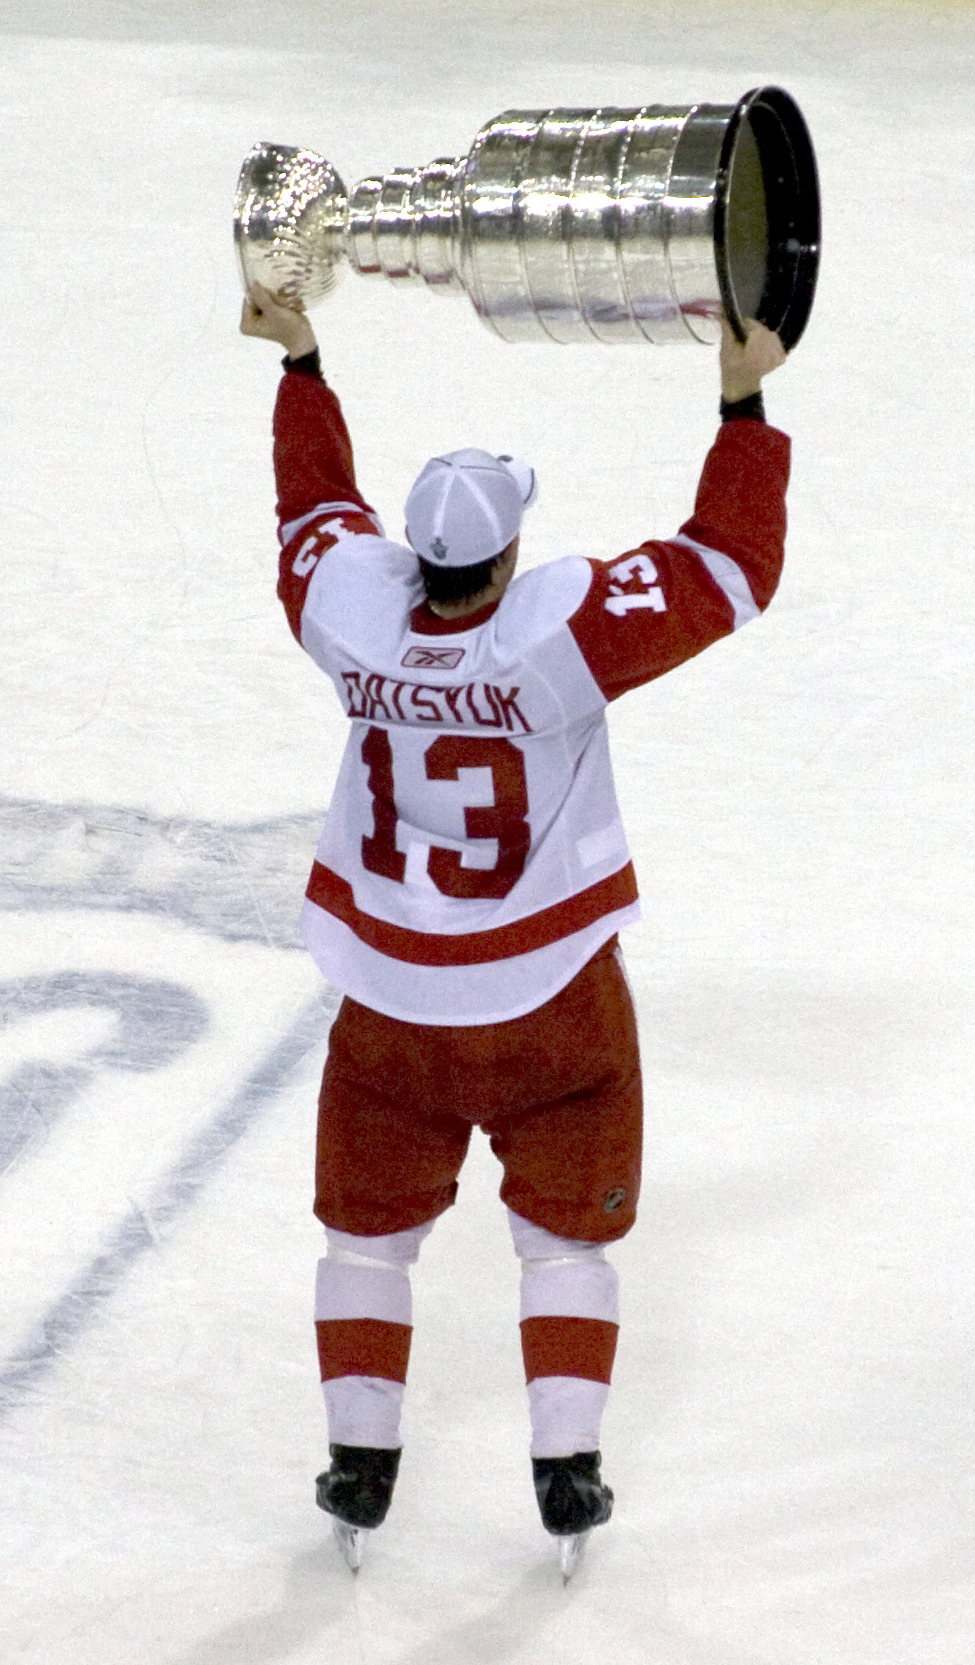 Bet on Pavel Datsyuk to retire